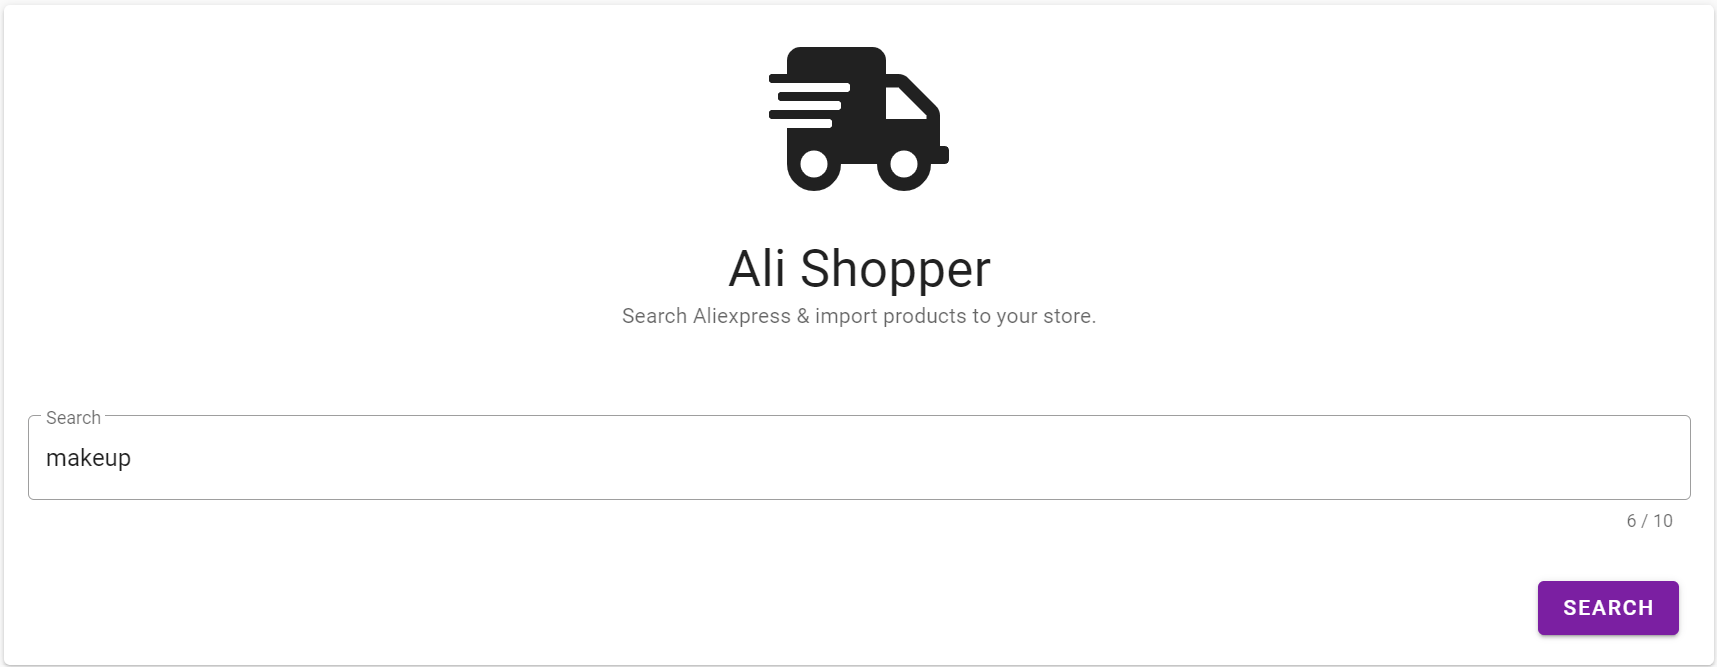 ali shopper